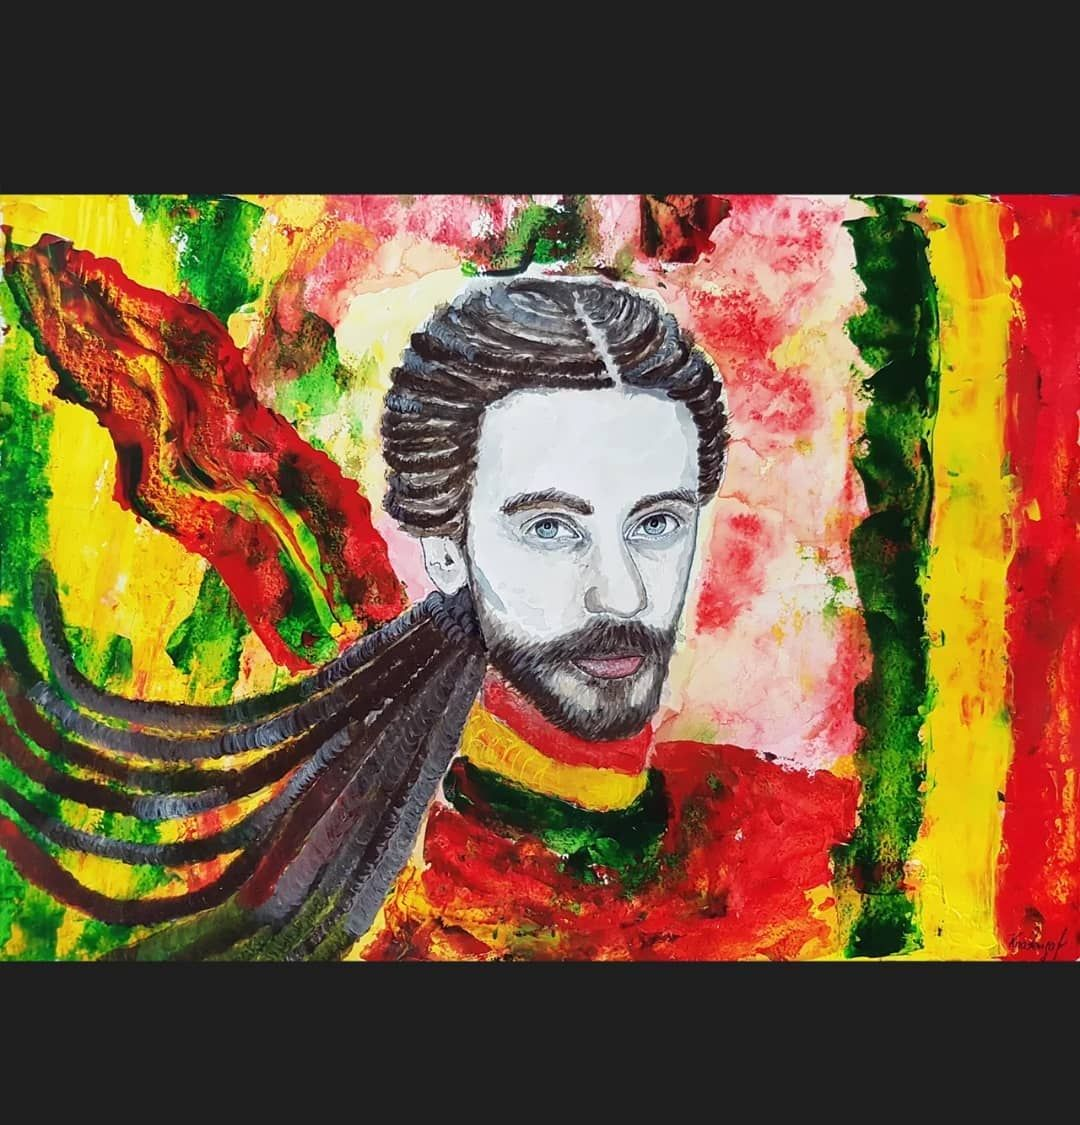 Kirill Akril Bumaga Moskva Decl Kirilltolmackii Art Mysliglubokopokaestsmysl Hudozhnik Prodazha Saatchi Etsy In 2020 Portraiture Art Pop Art Decor Painting